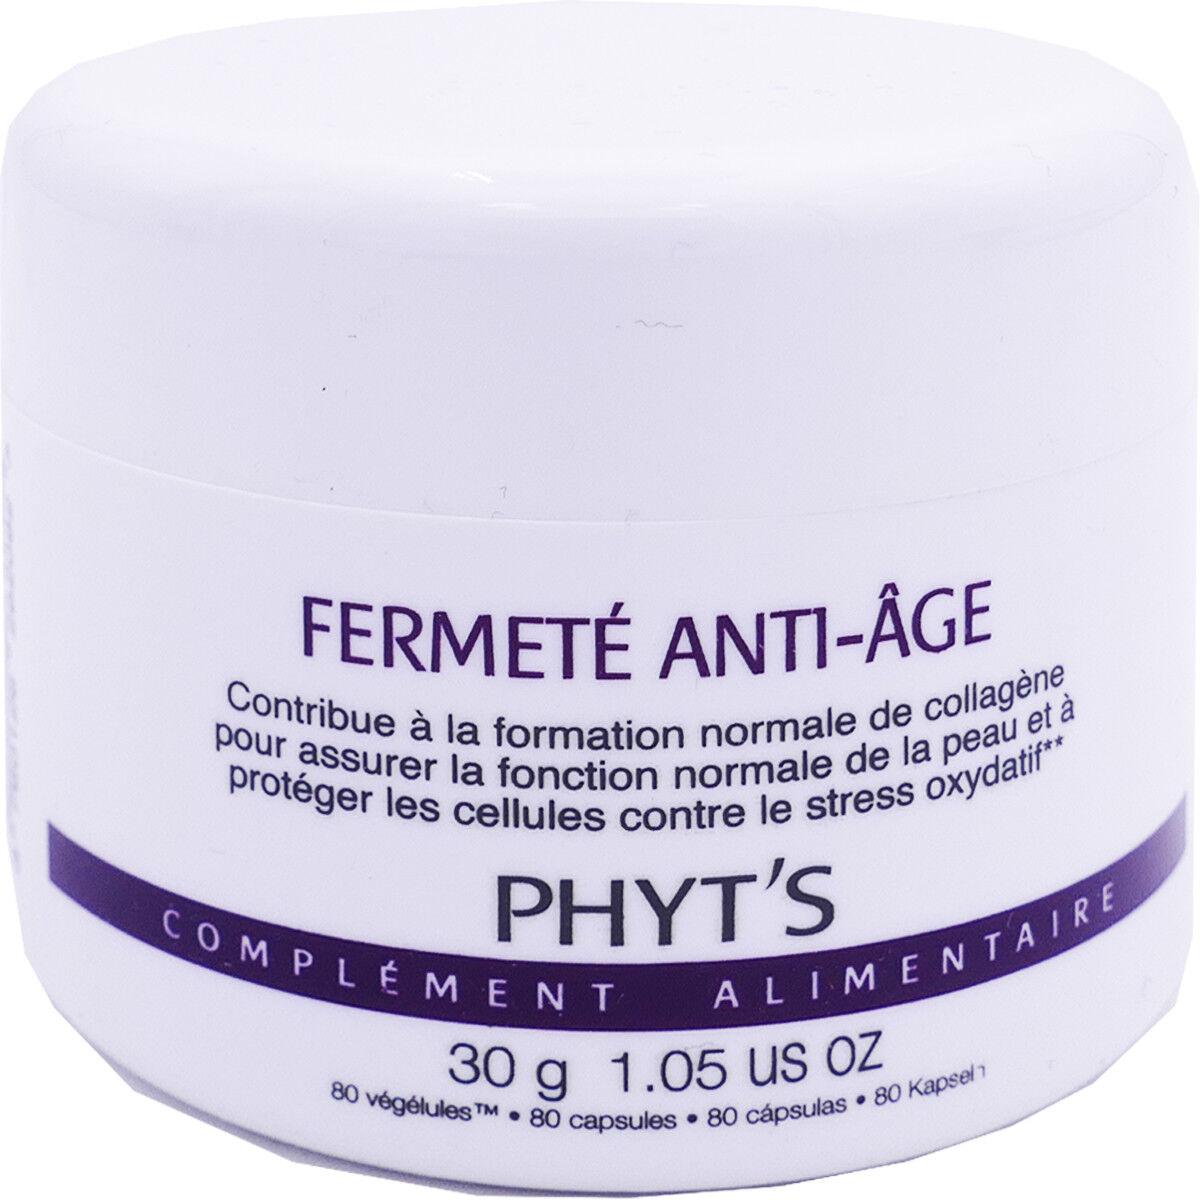 Phyt's fermete anti age 30 g